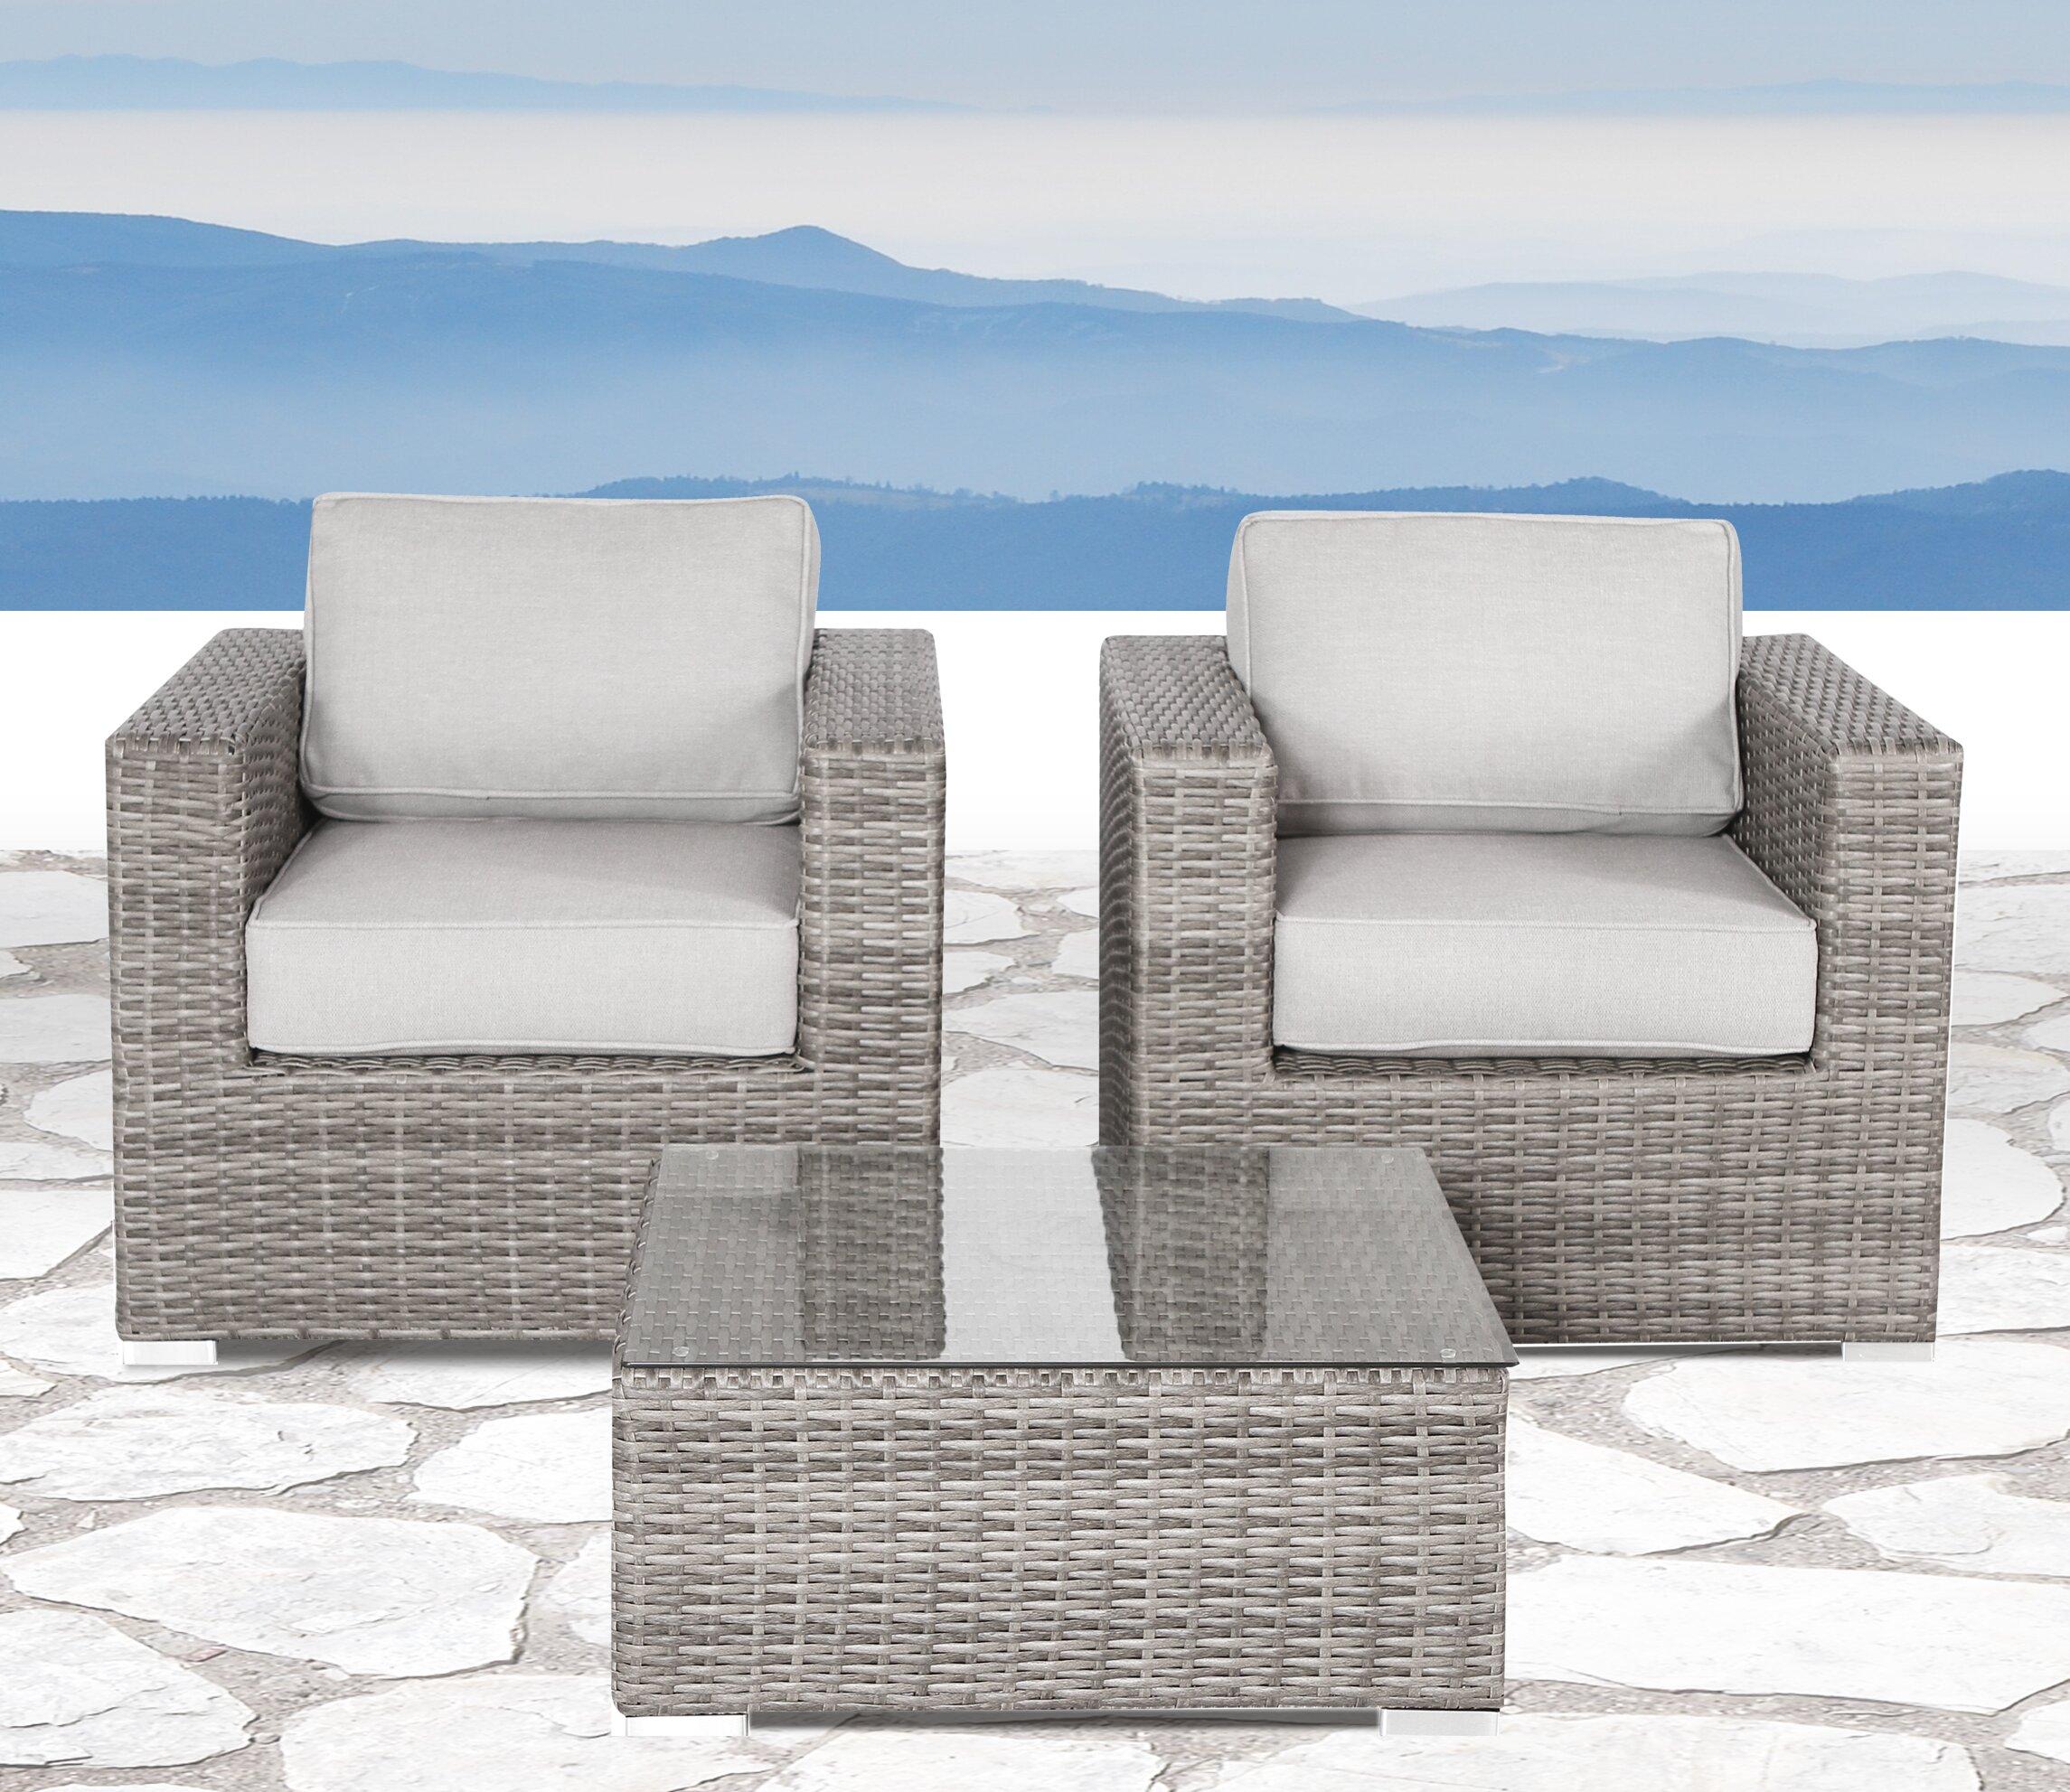 Enjoyable Deandra 3 Piece Conversation Set With Cushions Machost Co Dining Chair Design Ideas Machostcouk